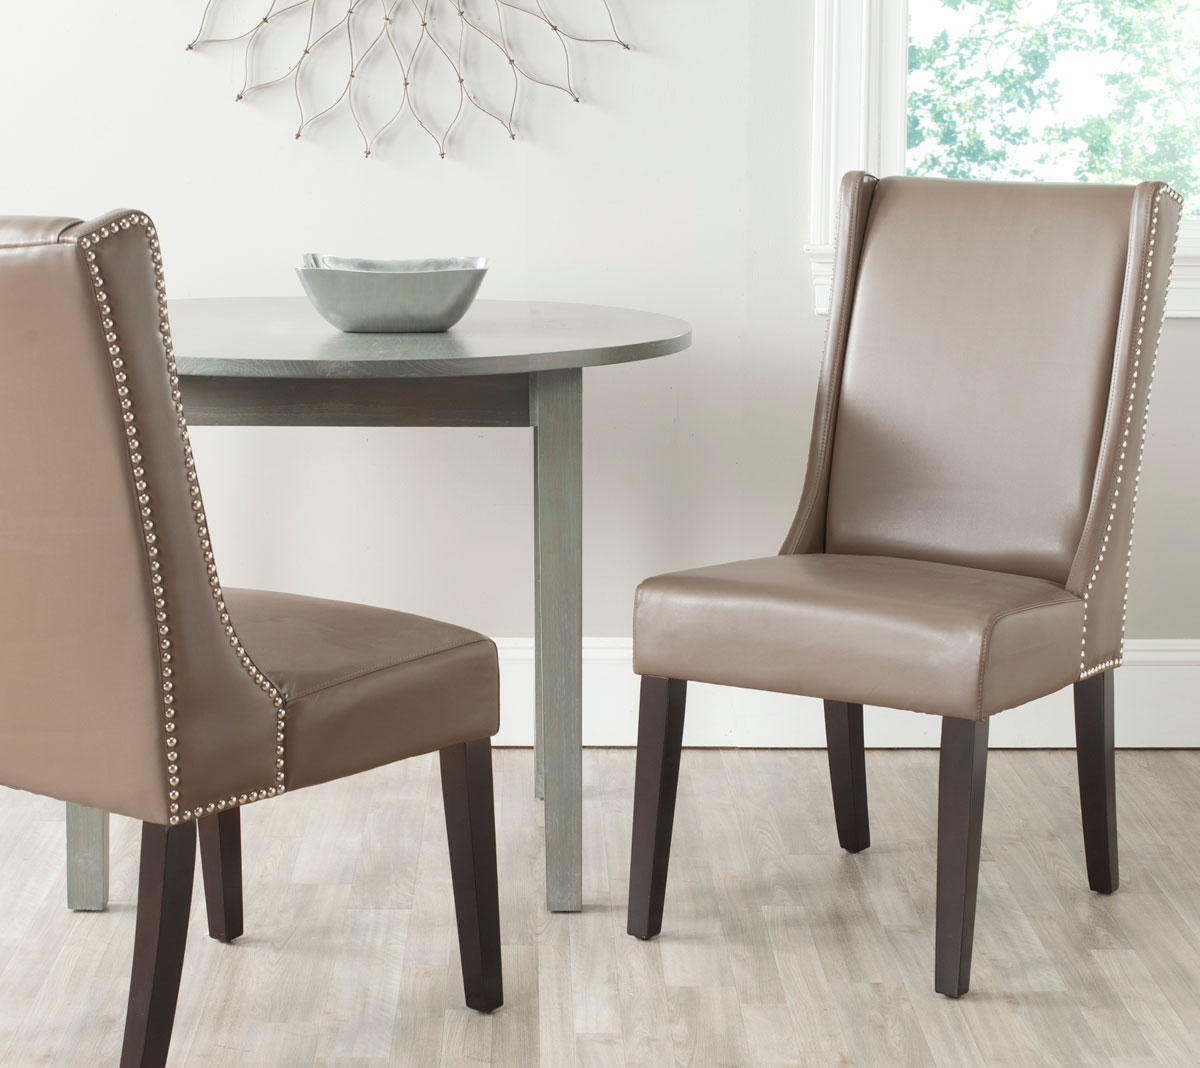 MCR4714B-SET2 Dining Chairs - Furniture by Safavieh  Safavieh